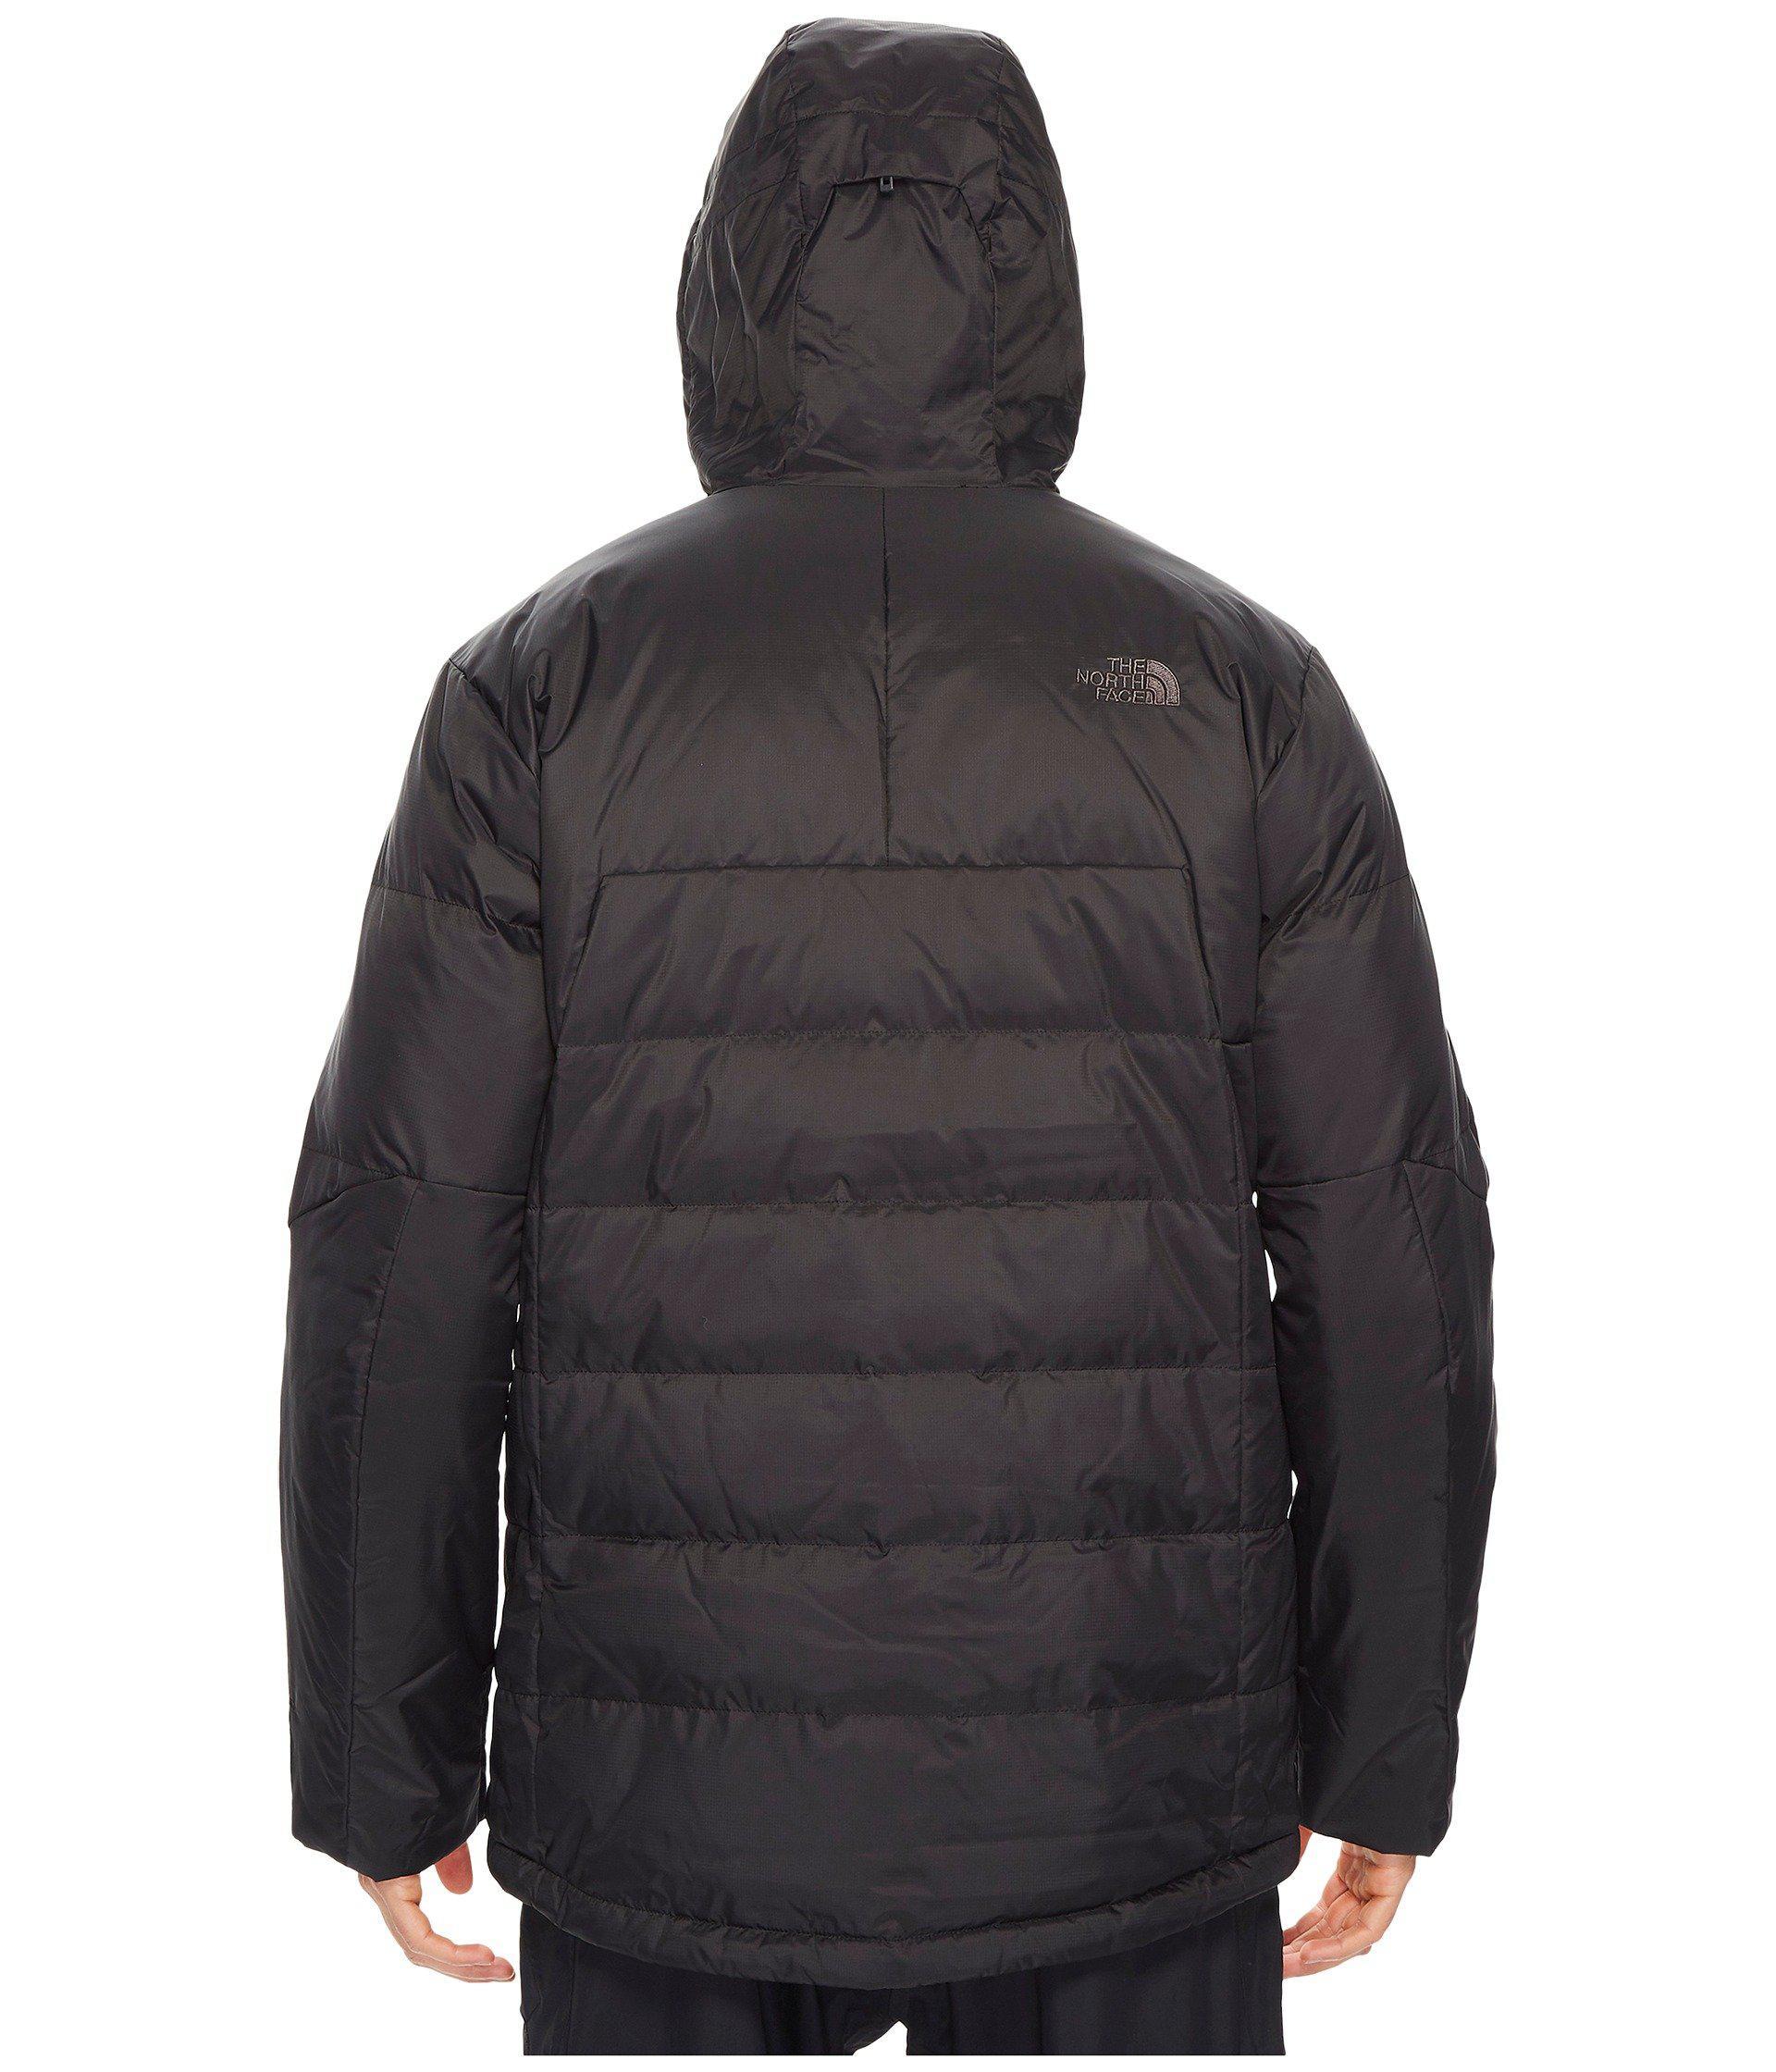 e5f3b4b0599e Lyst - The North Face Gatebreak Down Jacket in Black for Men